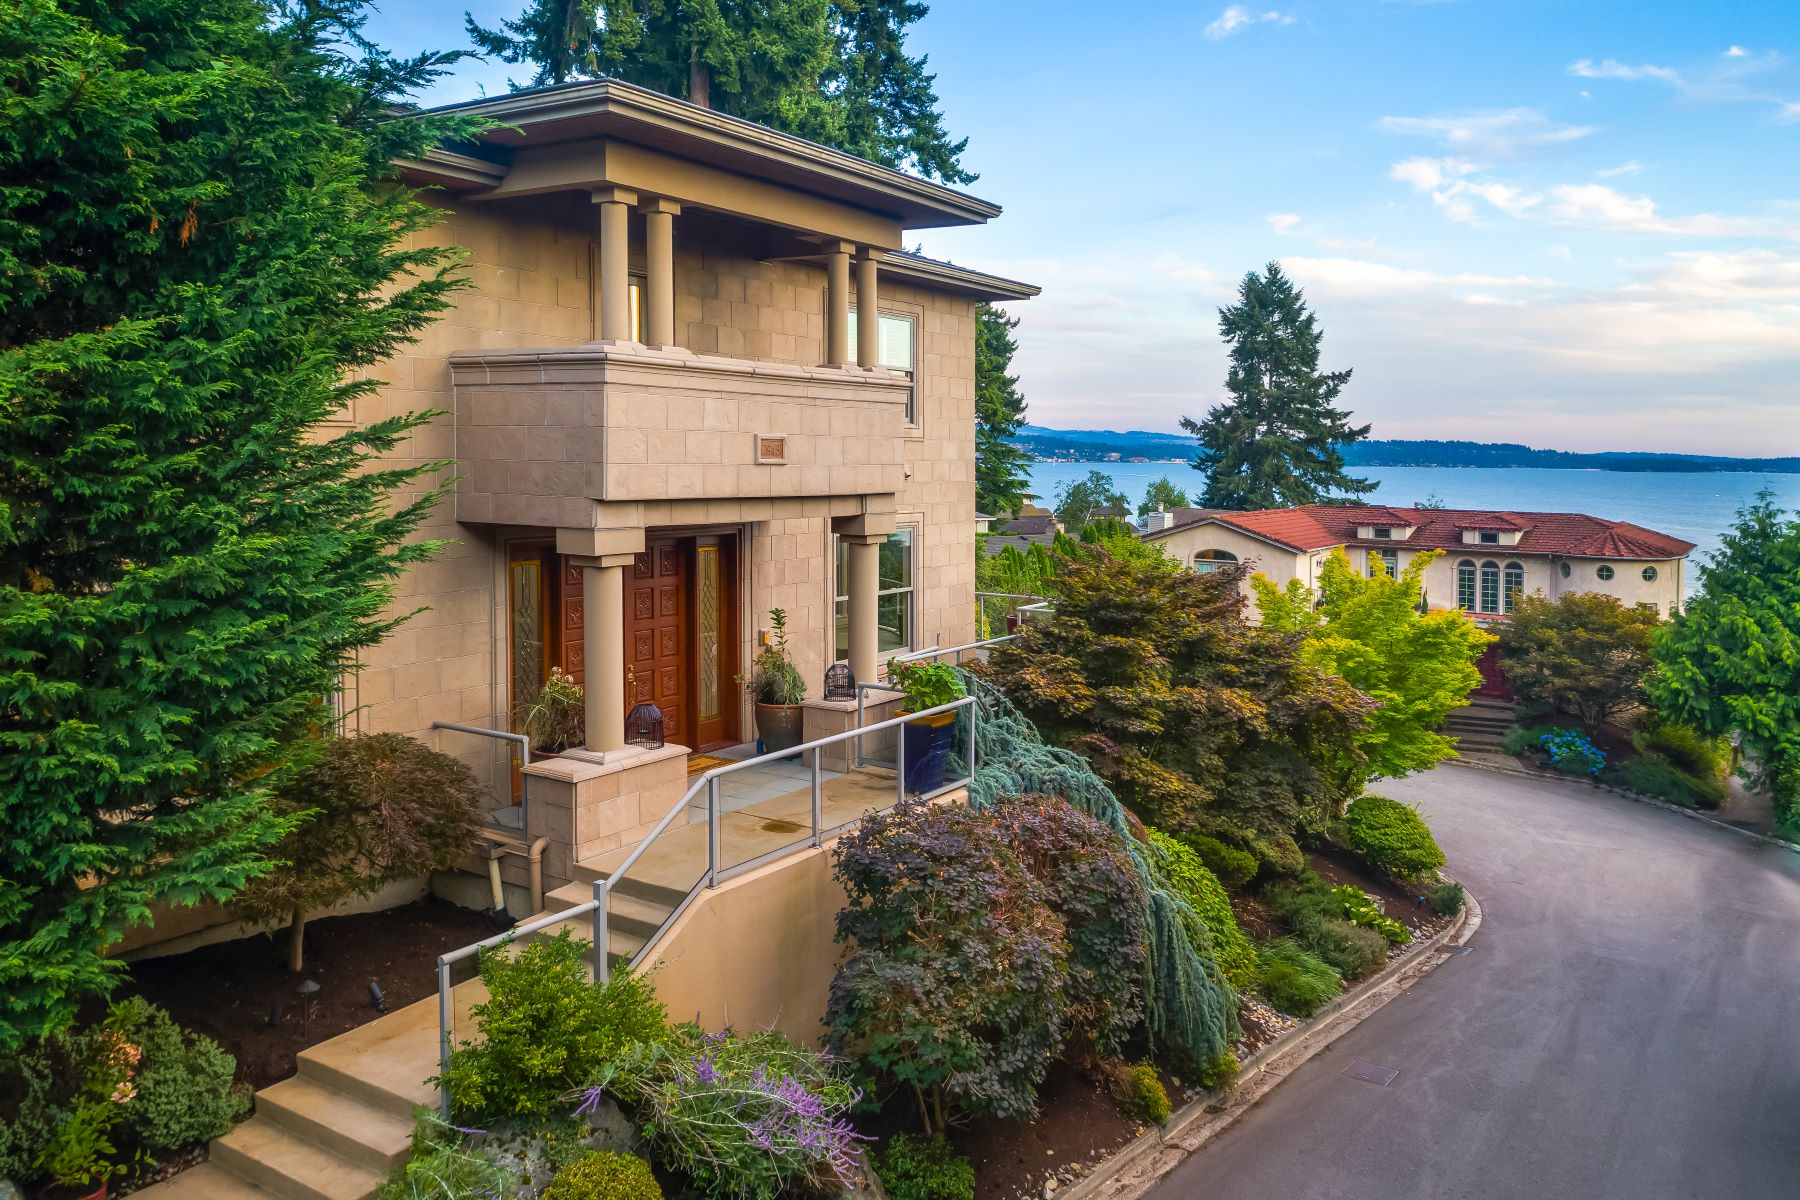 Single Family Homes for Sale at 7943 NE 112th St, Kirkland, WA 98034 7943 NE 112th St Kirkland, Washington 98034 United States